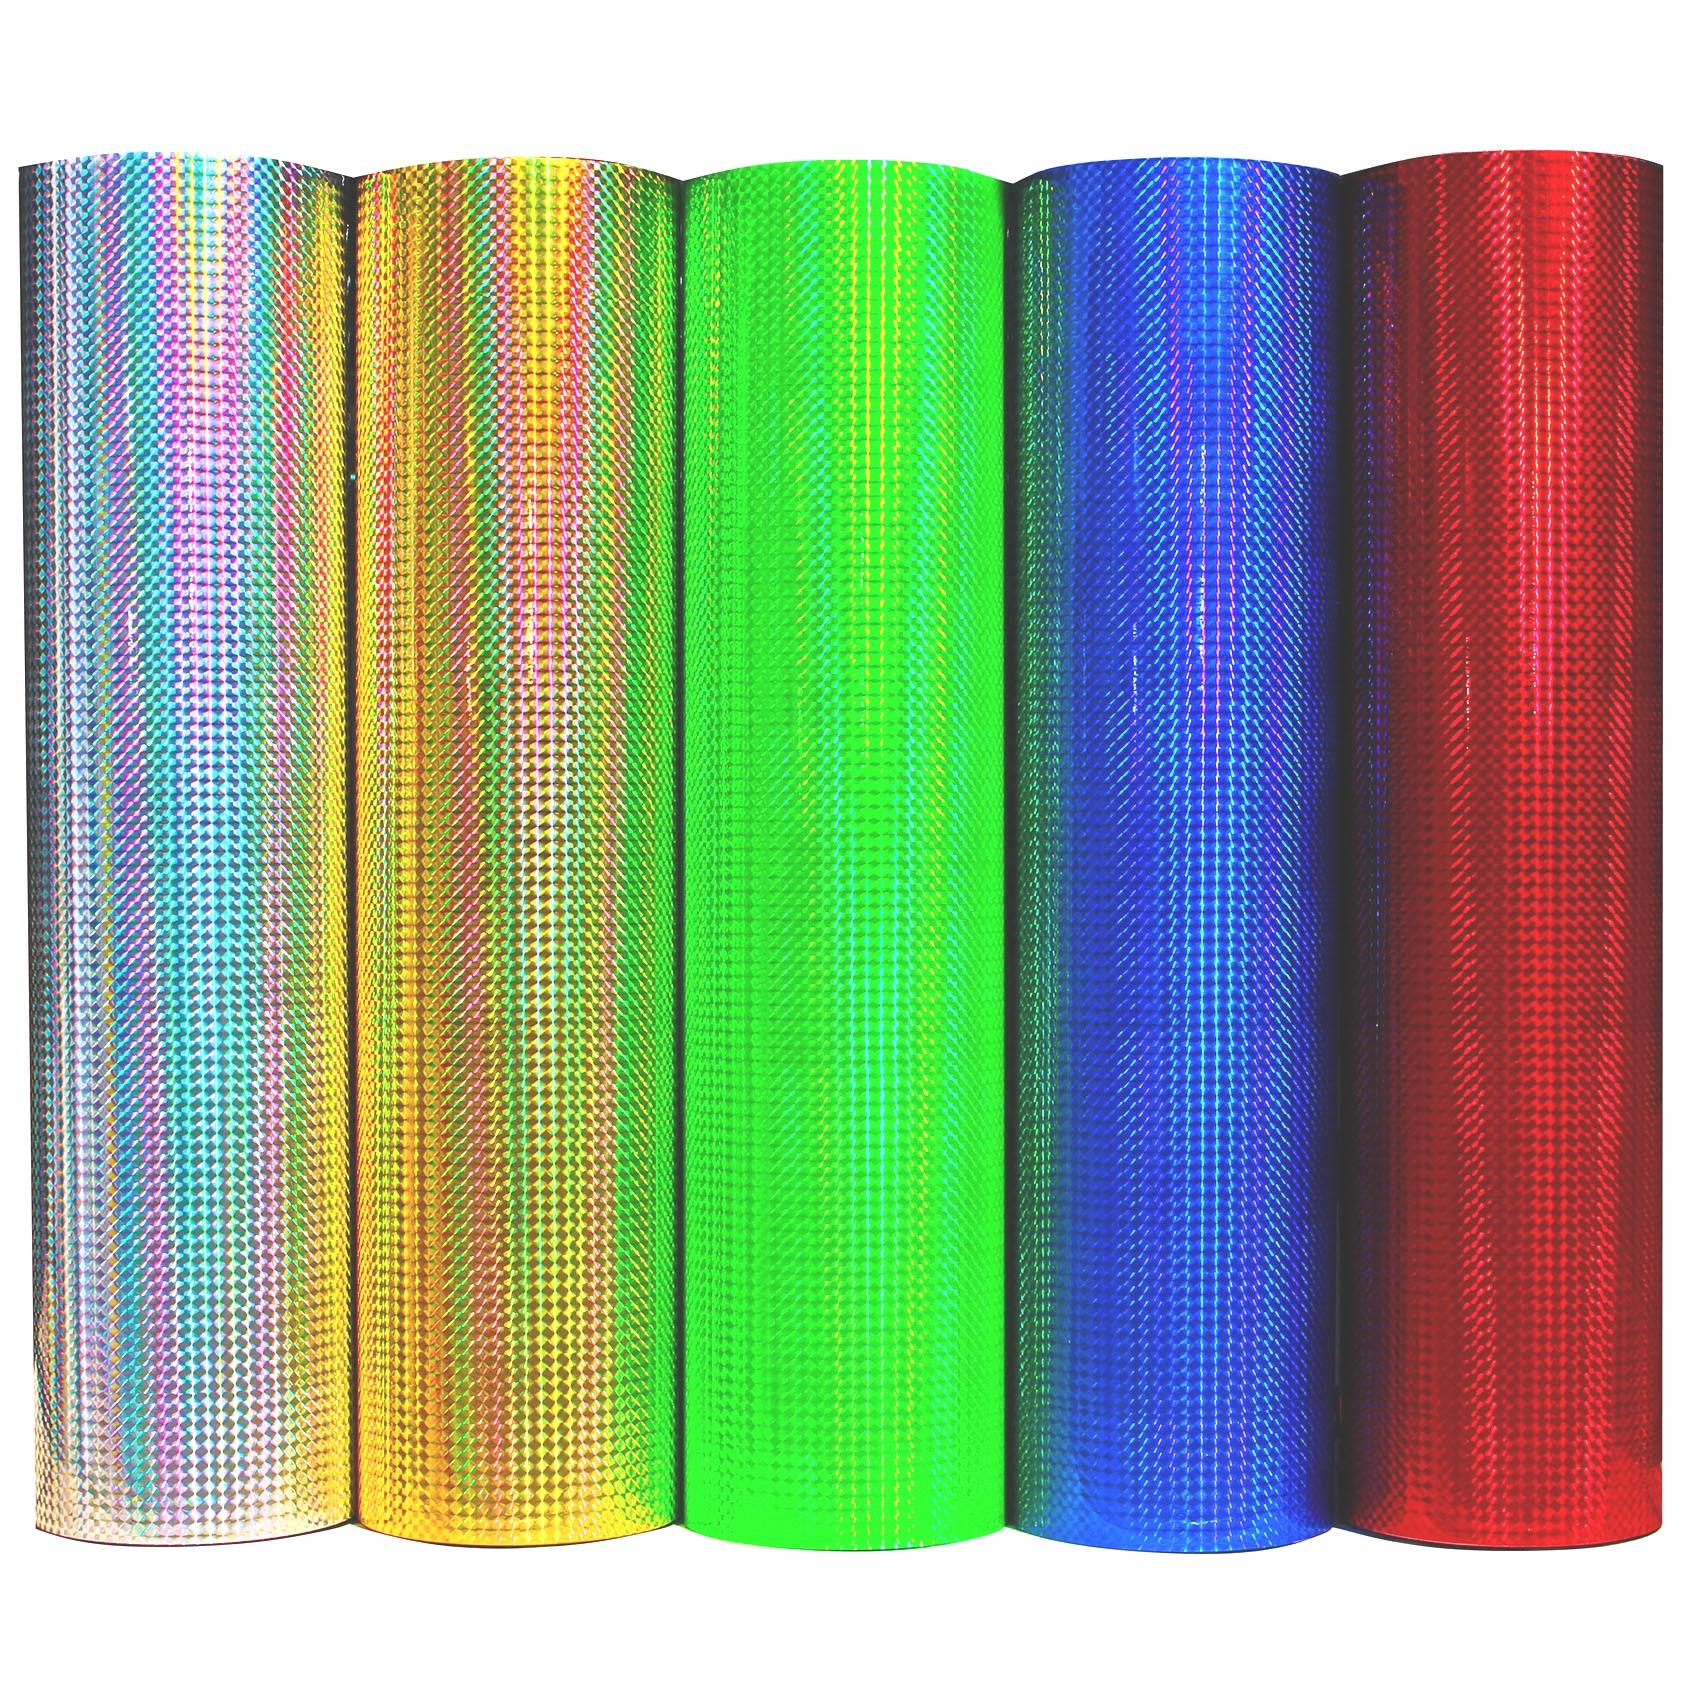 19-49-26-20-m-Plotterfolie-Hologramm-Oilslick-Folie-Aufkleber-Plottfolie Indexbild 30